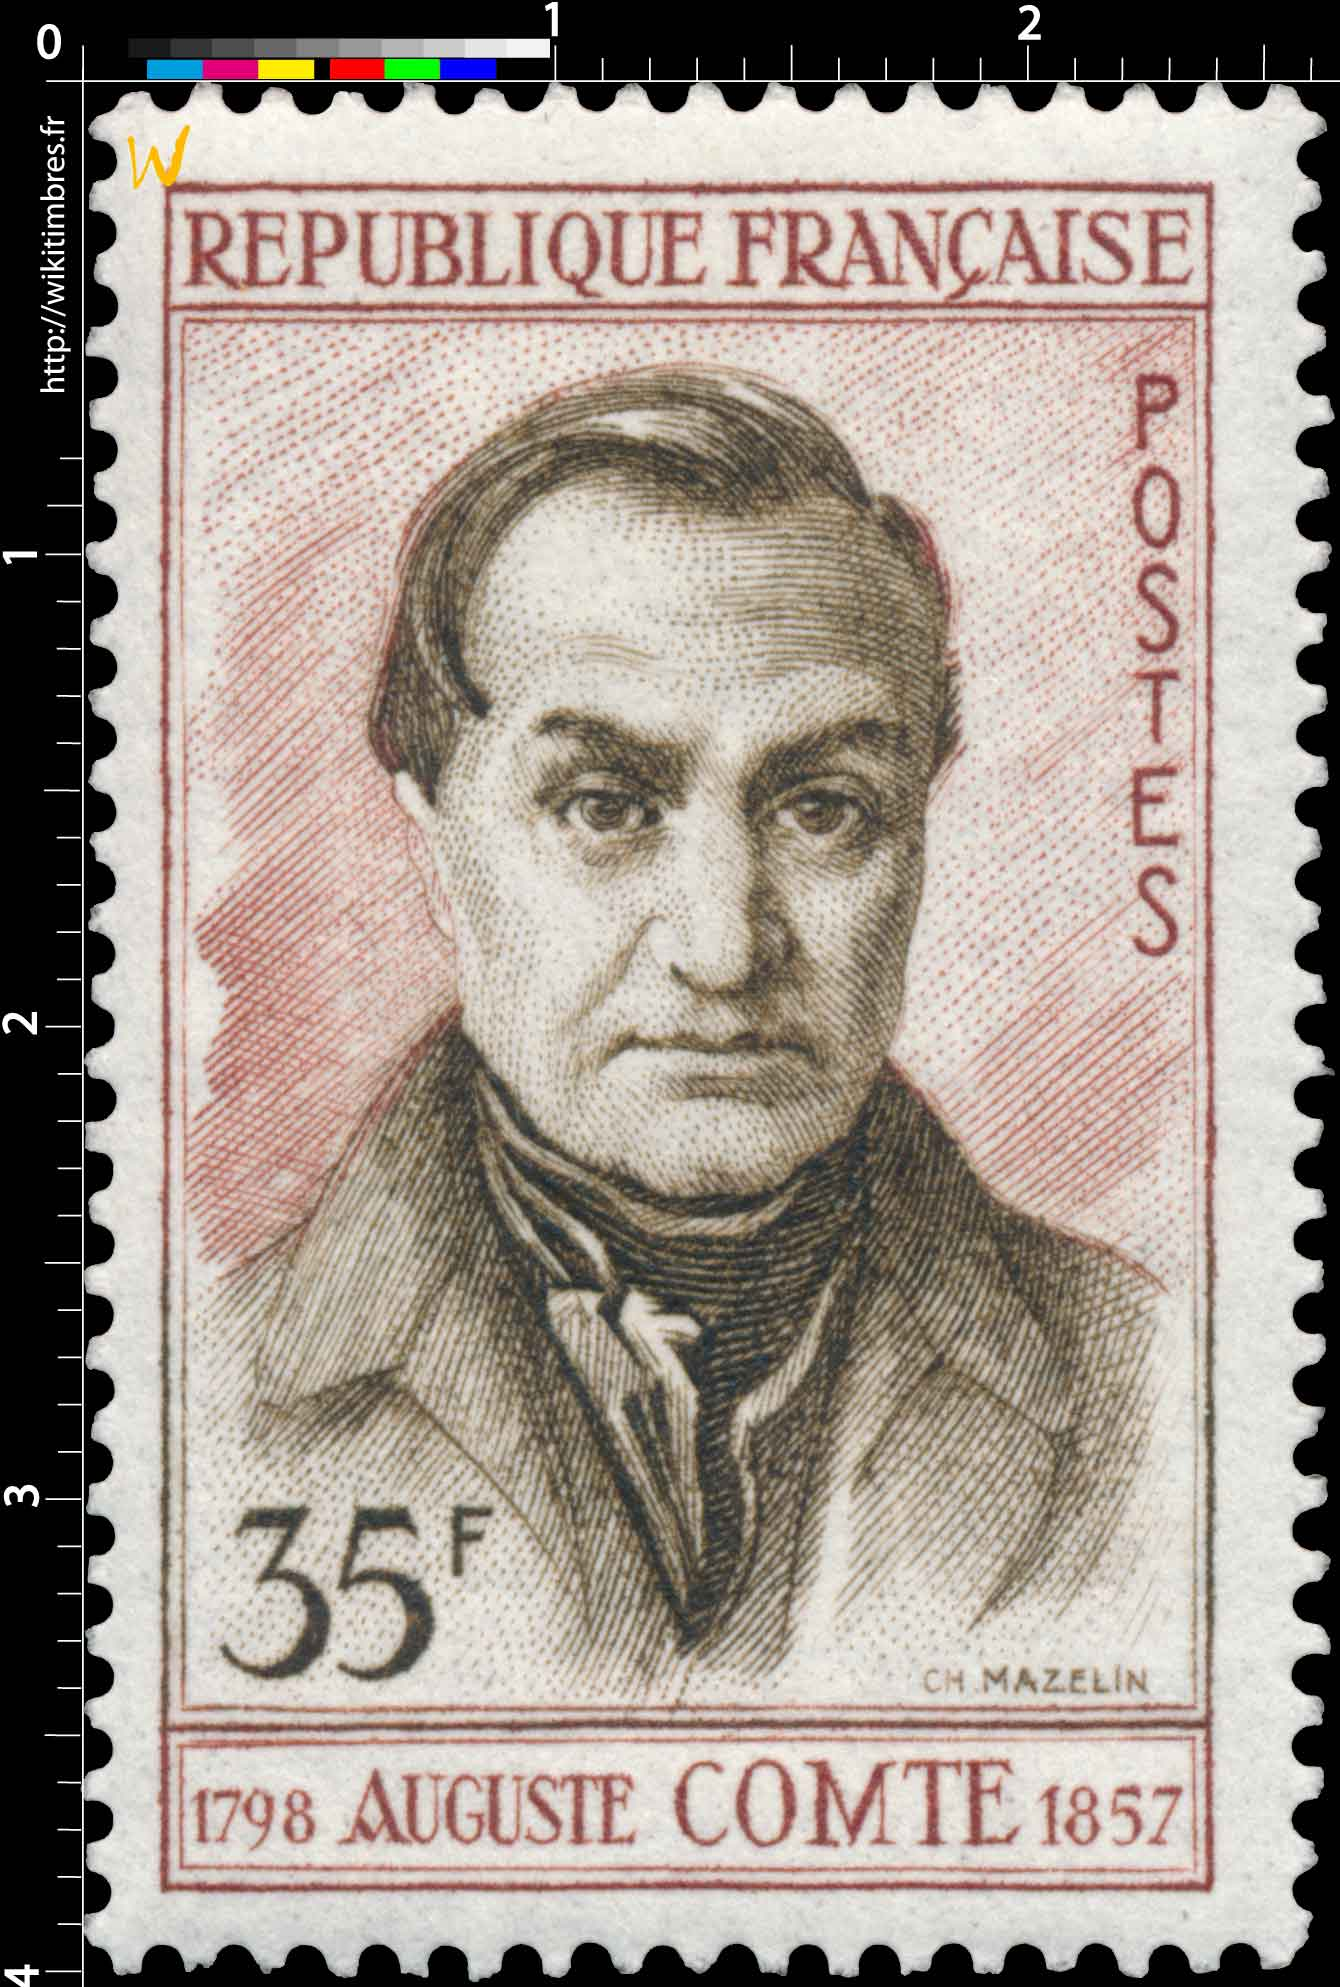 AUGUSTE COMTE 1798-1957